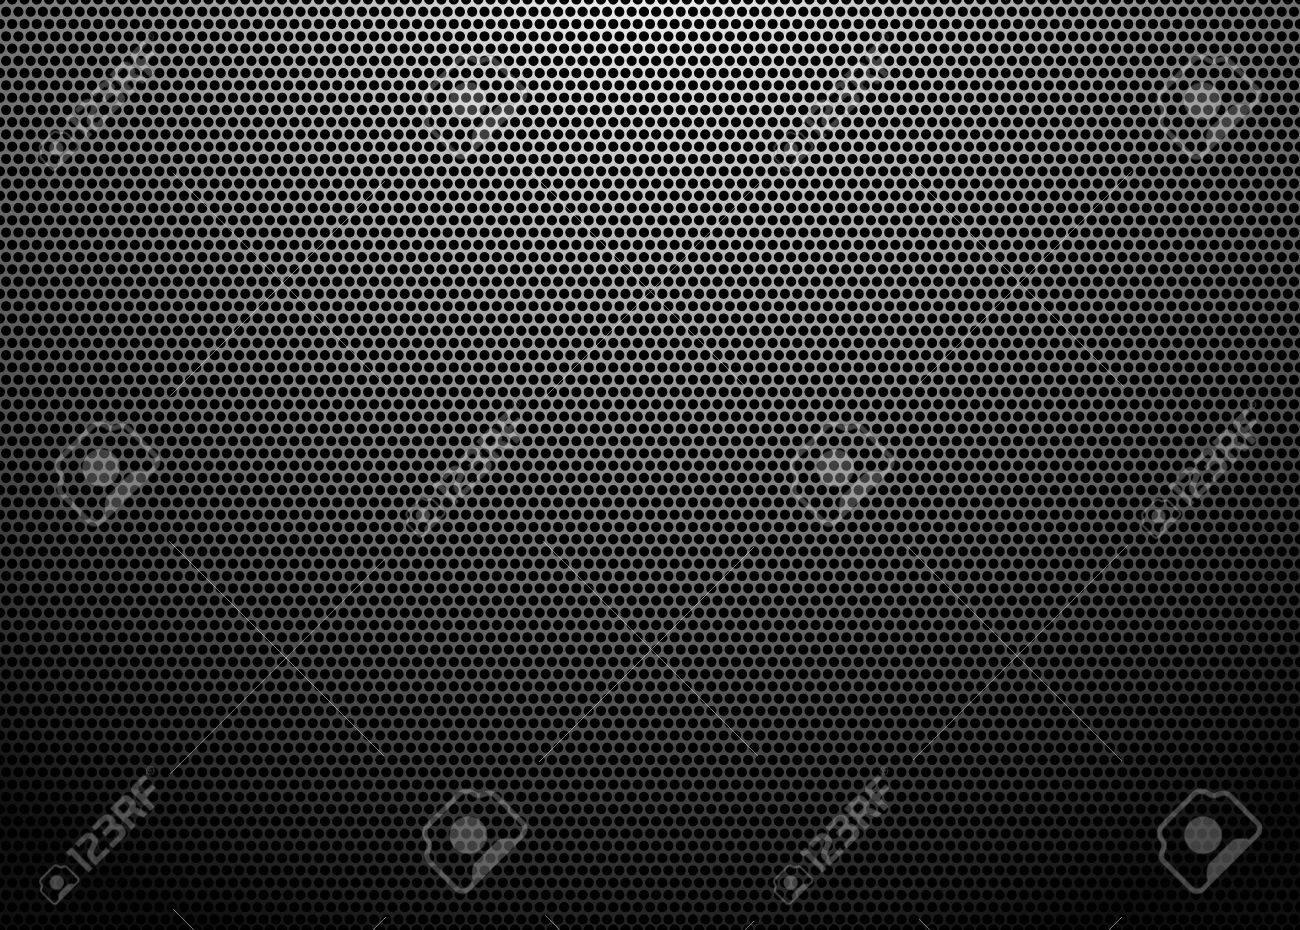 Abstract metall backdrop - 11671537